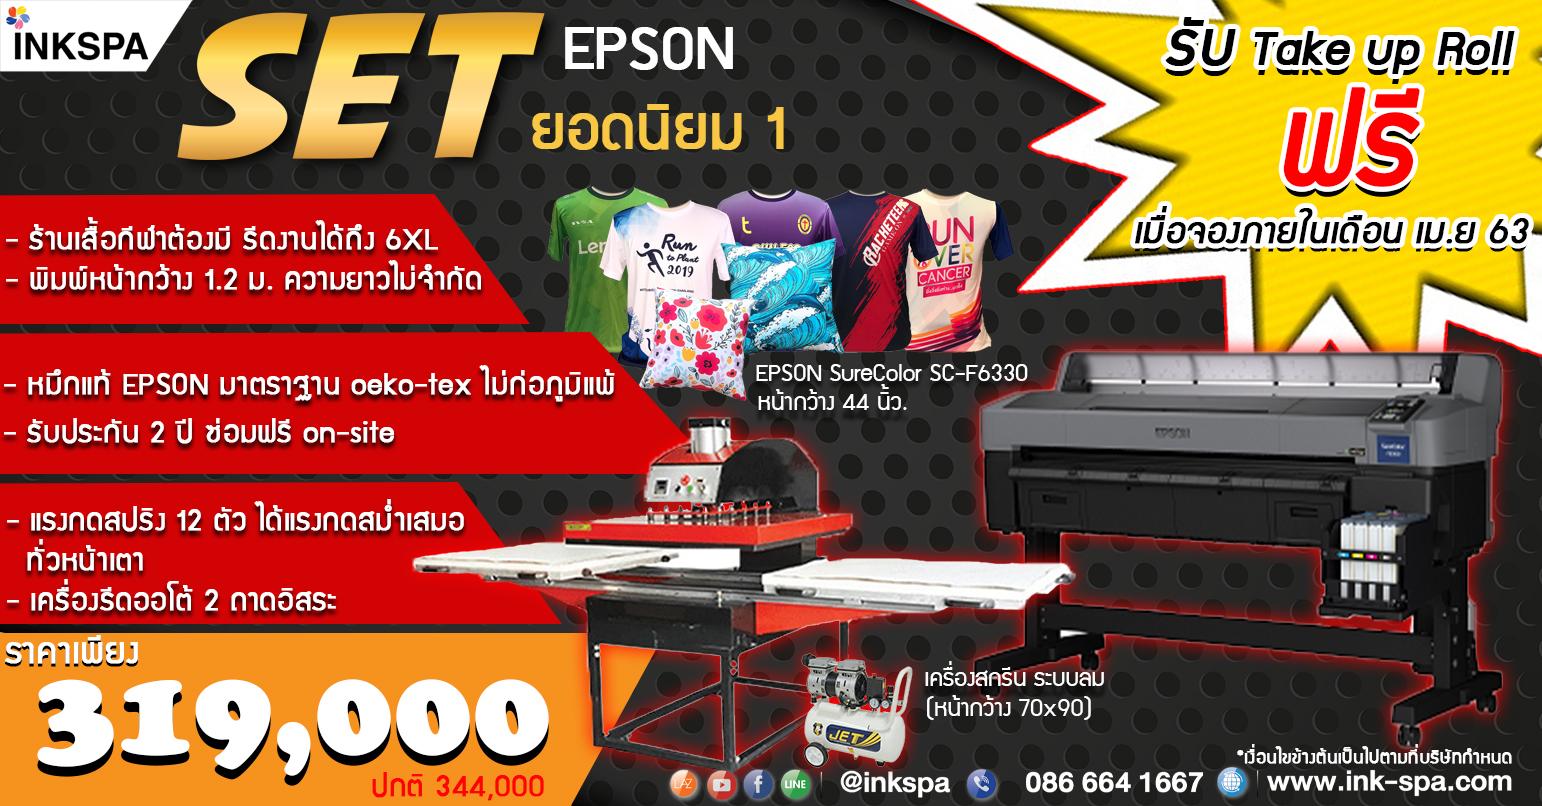 Epson F6330 , เครื่องพิมพ์ Epson, เครื่องพิมพ์ Siblimation, เครื่องพิมพ์เสื้อ, เครื่องสกรีนเสื้อ, เครื่องพิมพ์ซับลิเมชั่น